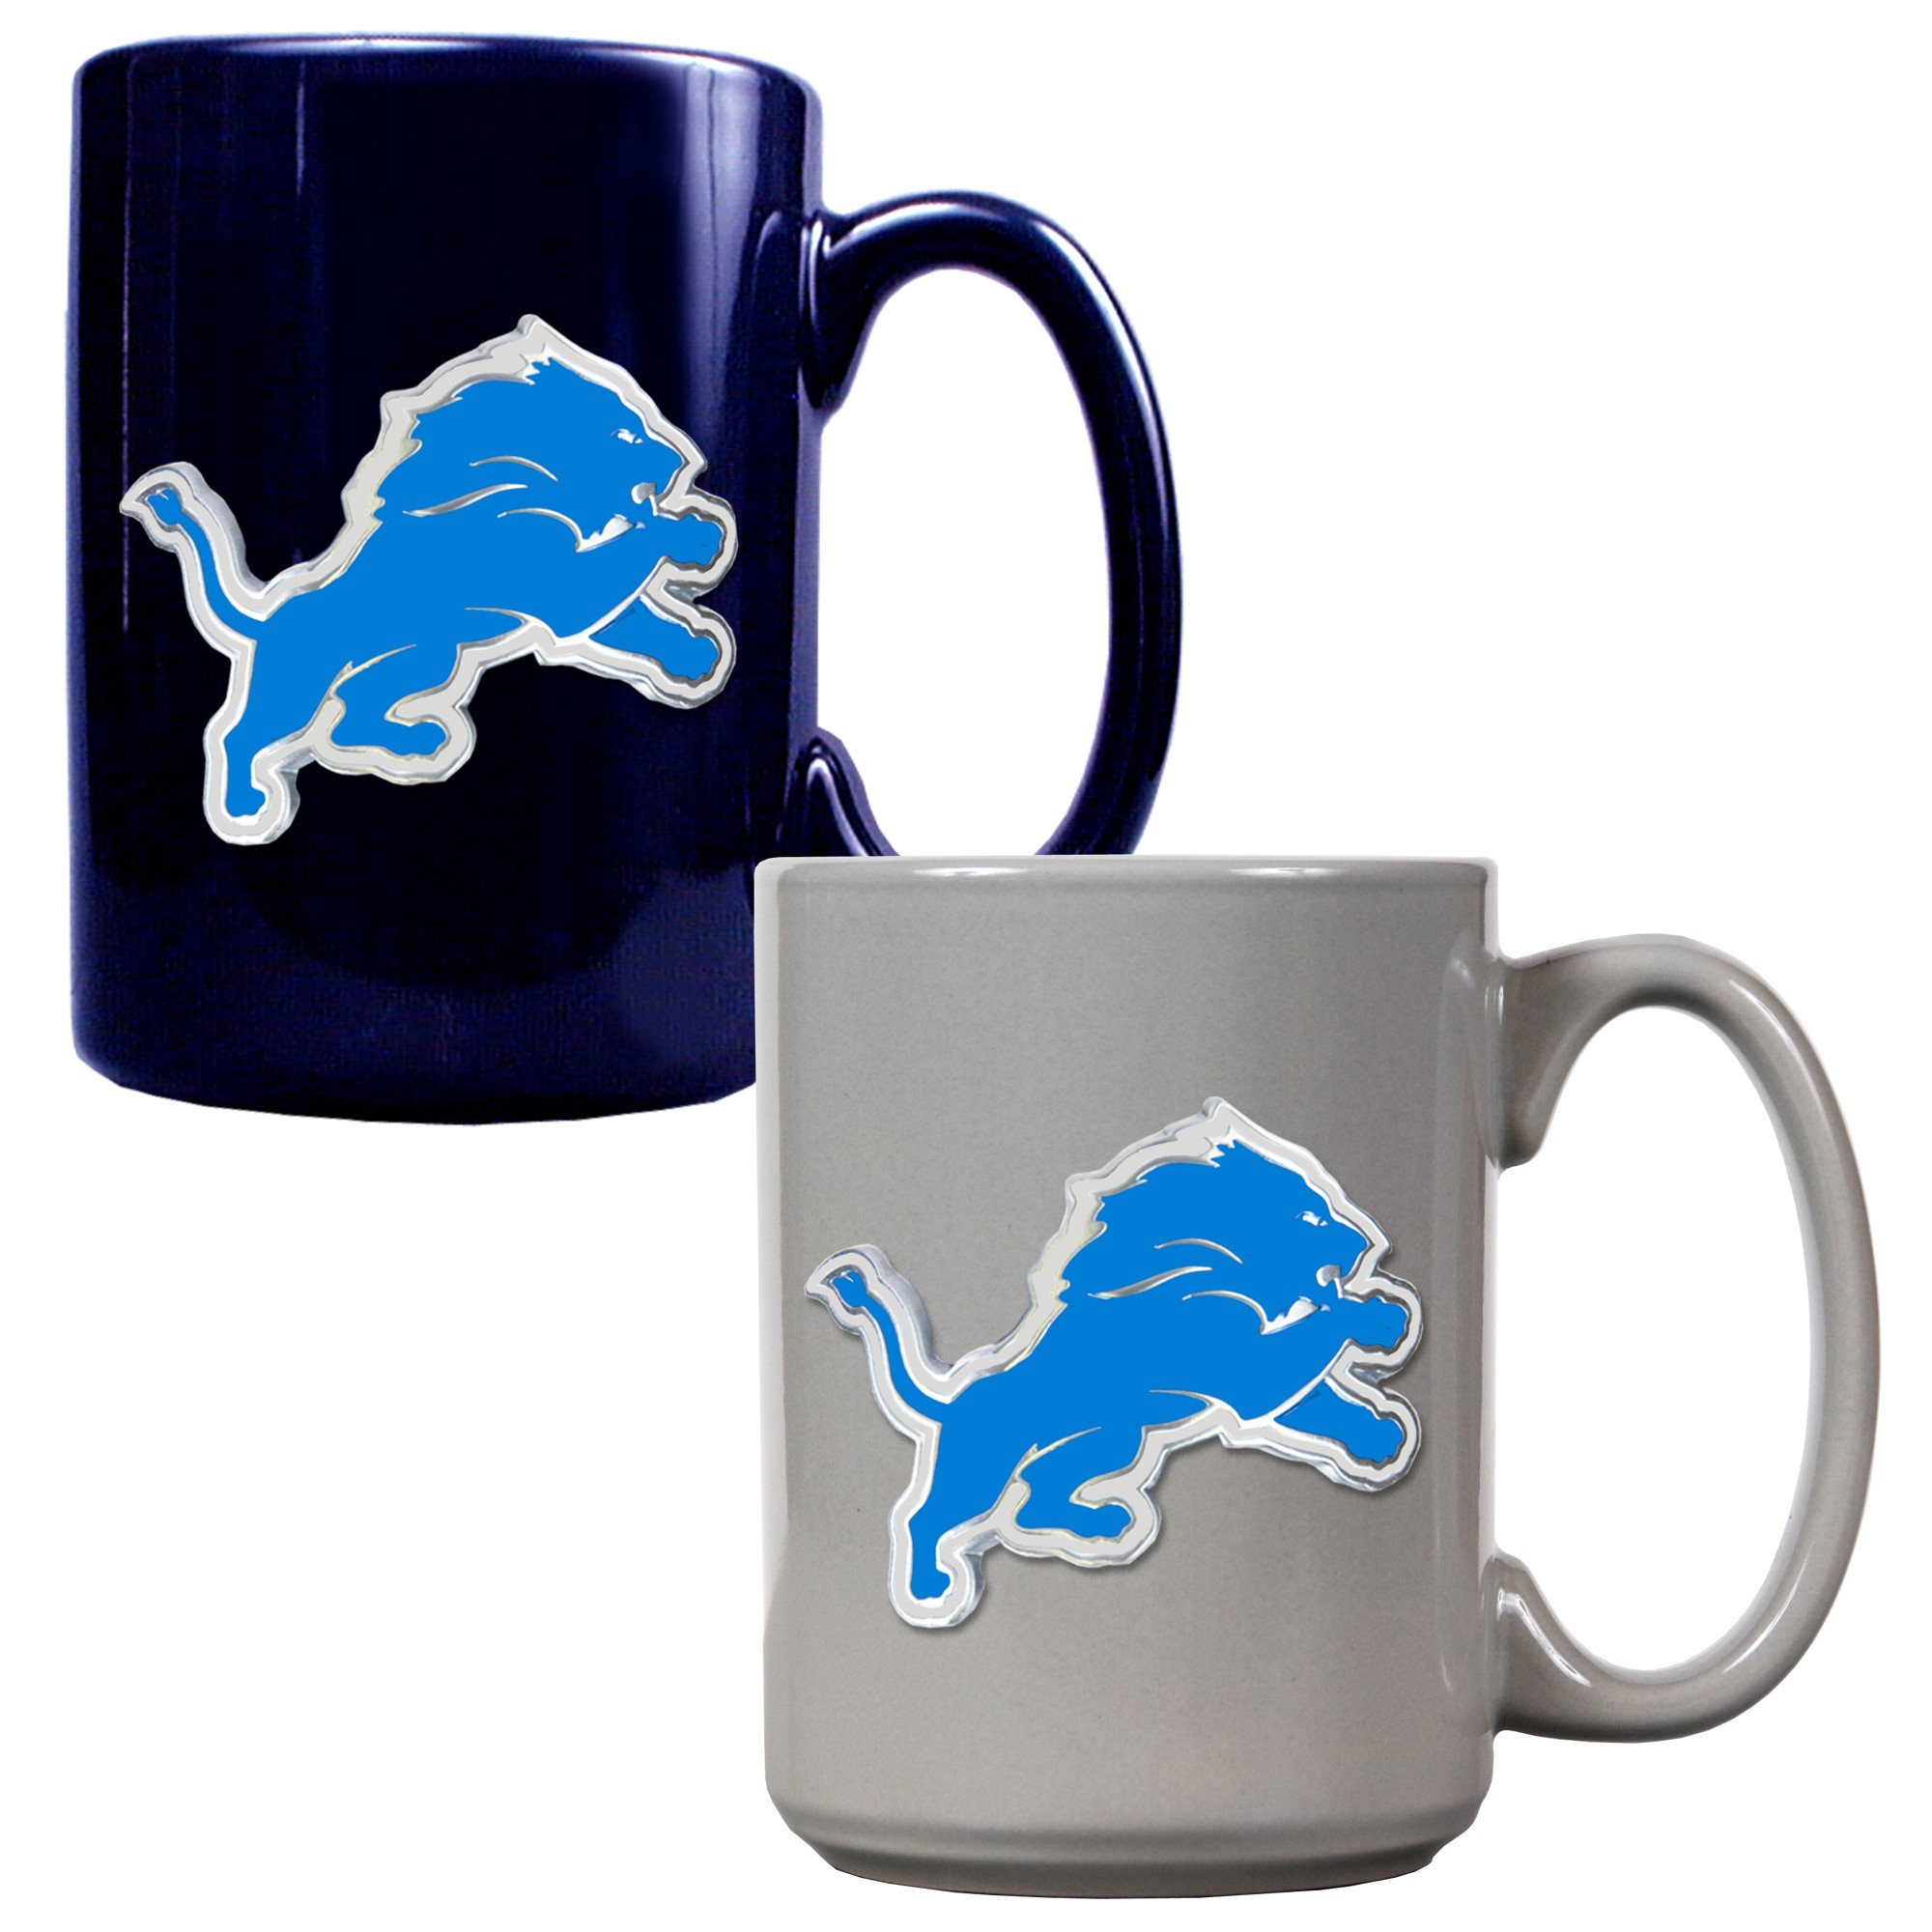 Detroit Lions 15oz. Coffee Mug Set - Blue/Gray - No Size